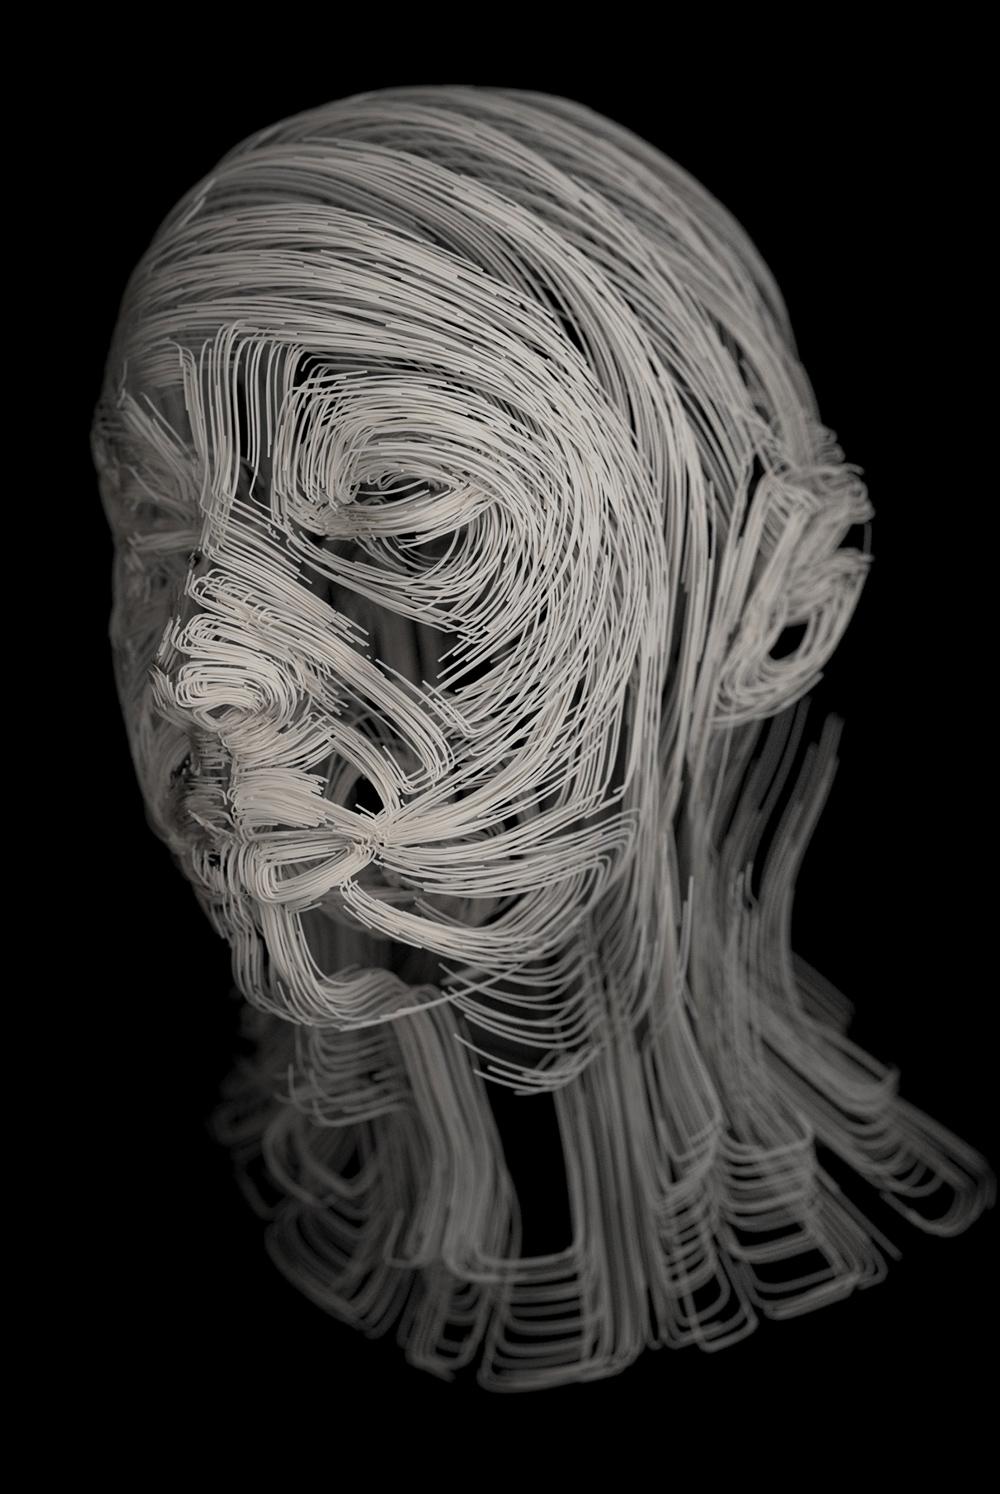 Spaghetti_Man_three_Scection_02